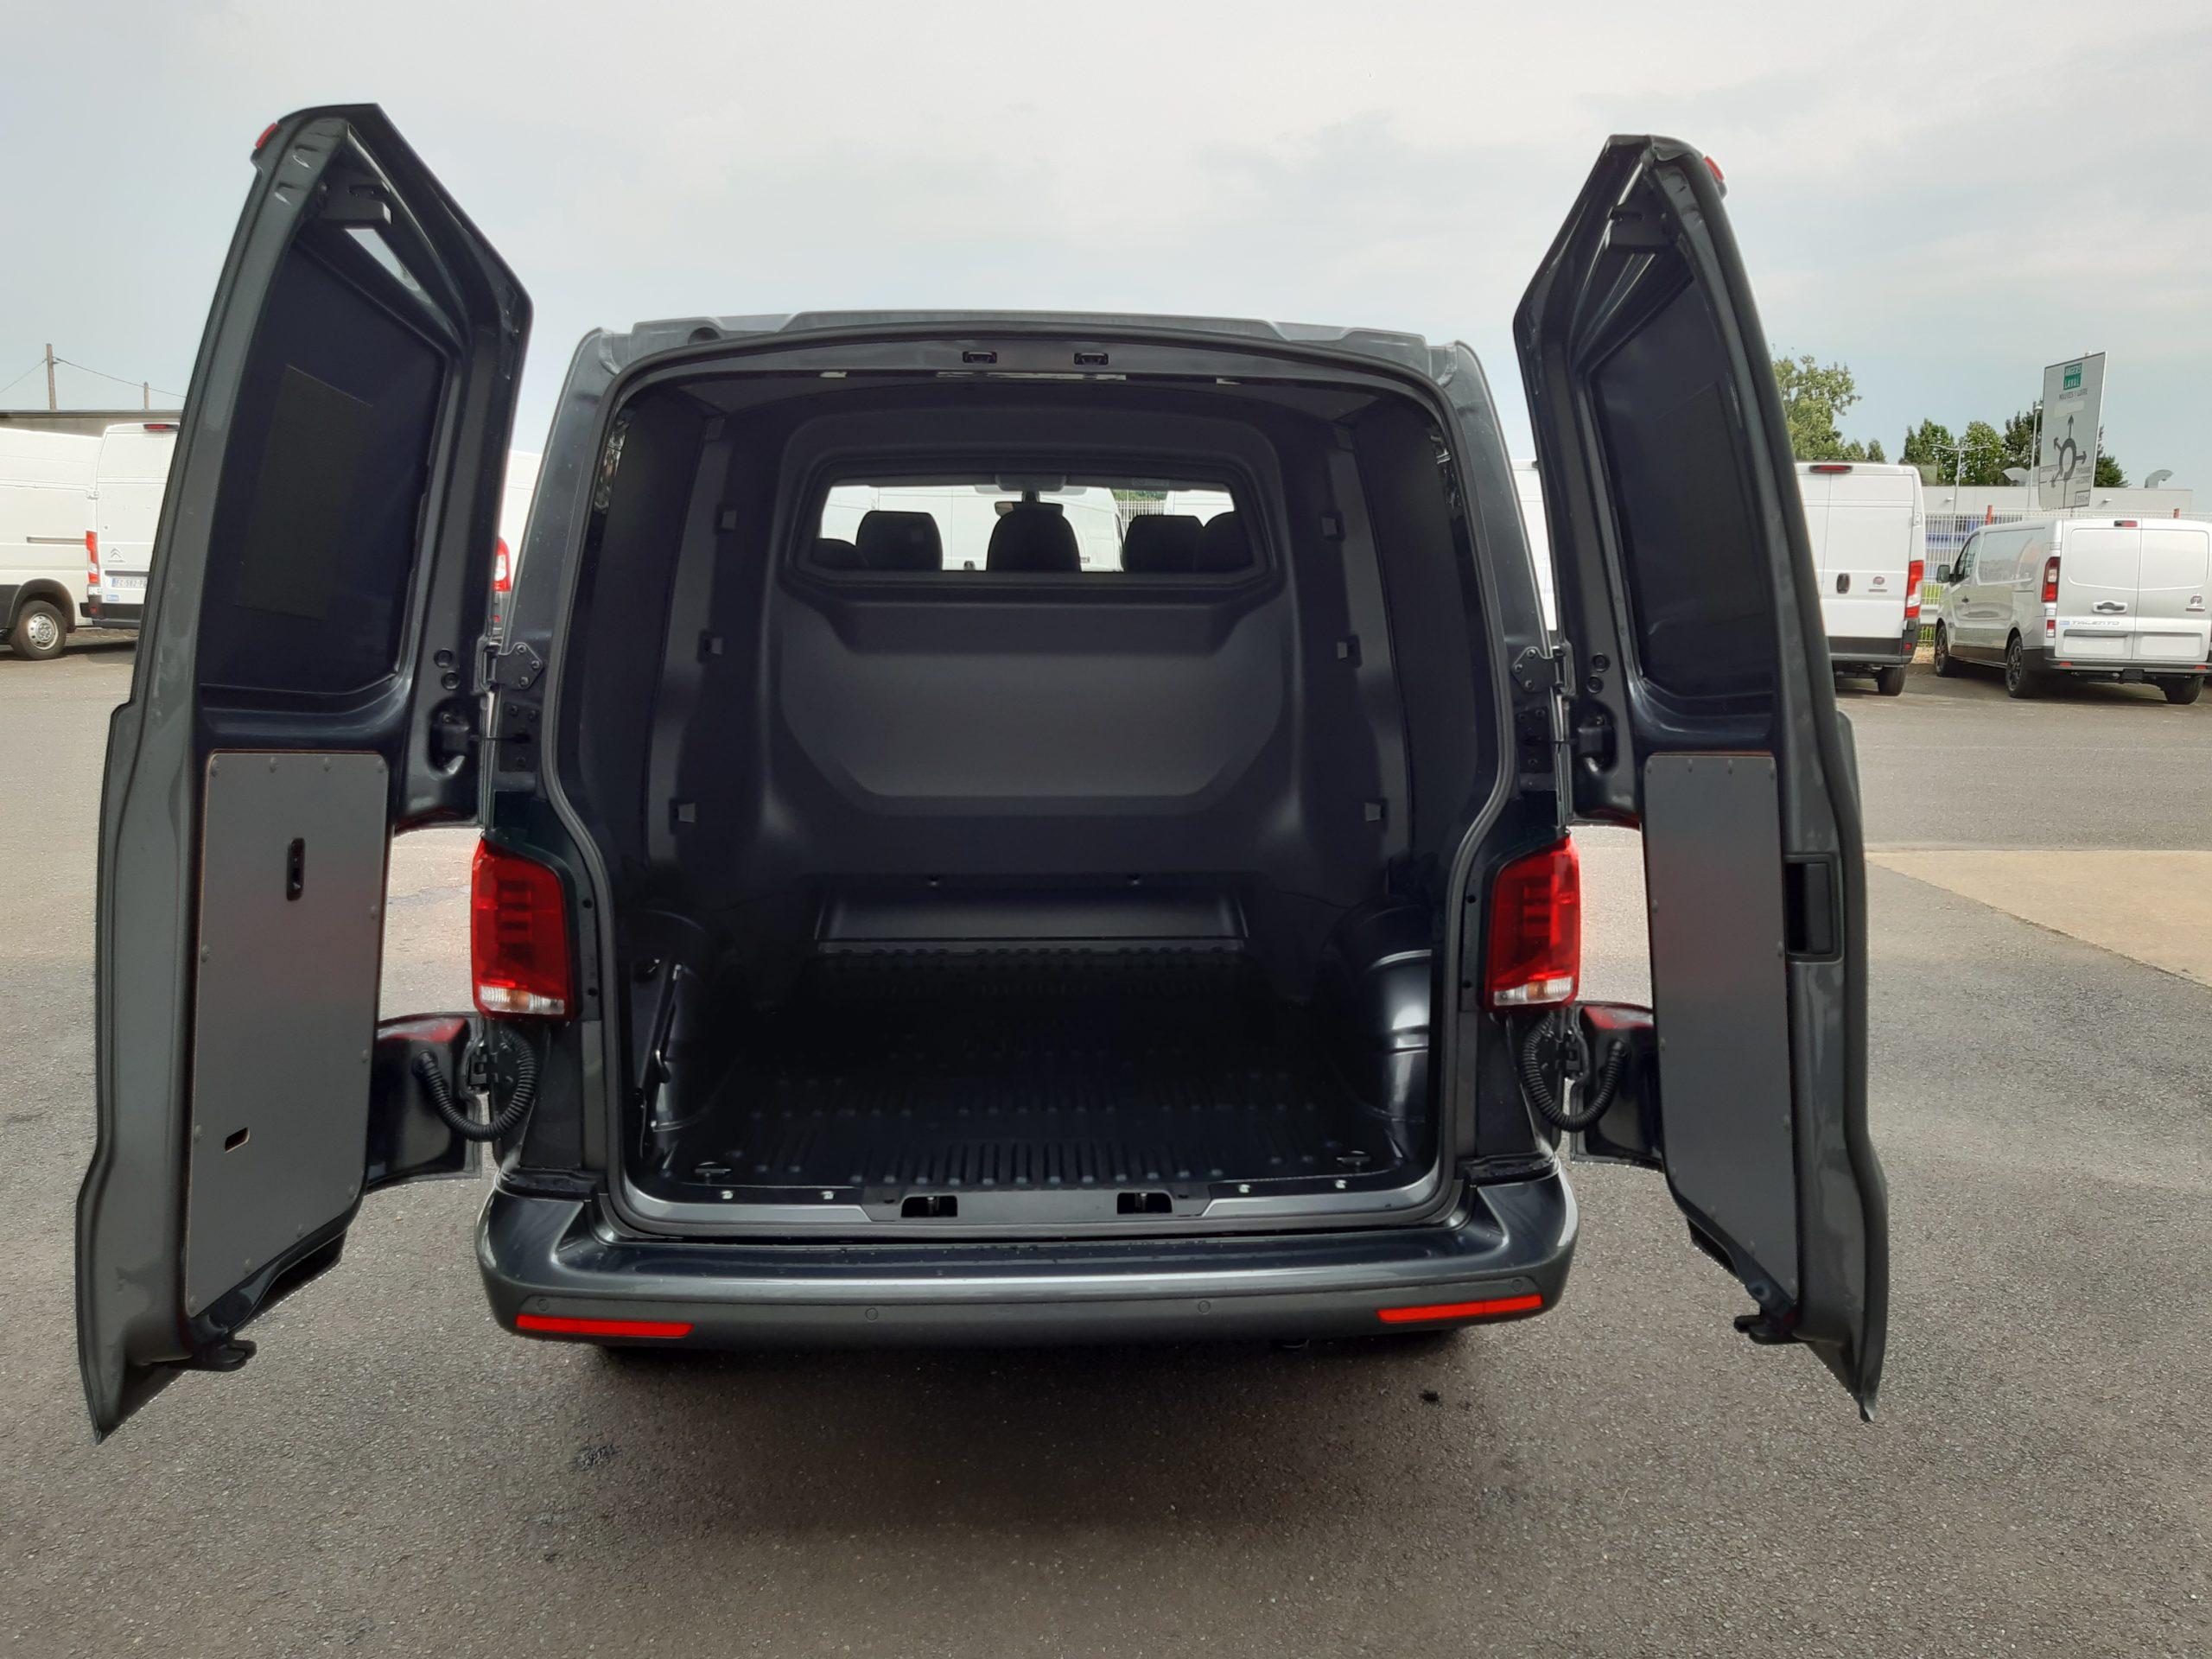 Location d'un fourgon compact double cabine - Volkswagen T6-1 Cabine APP - Vue6